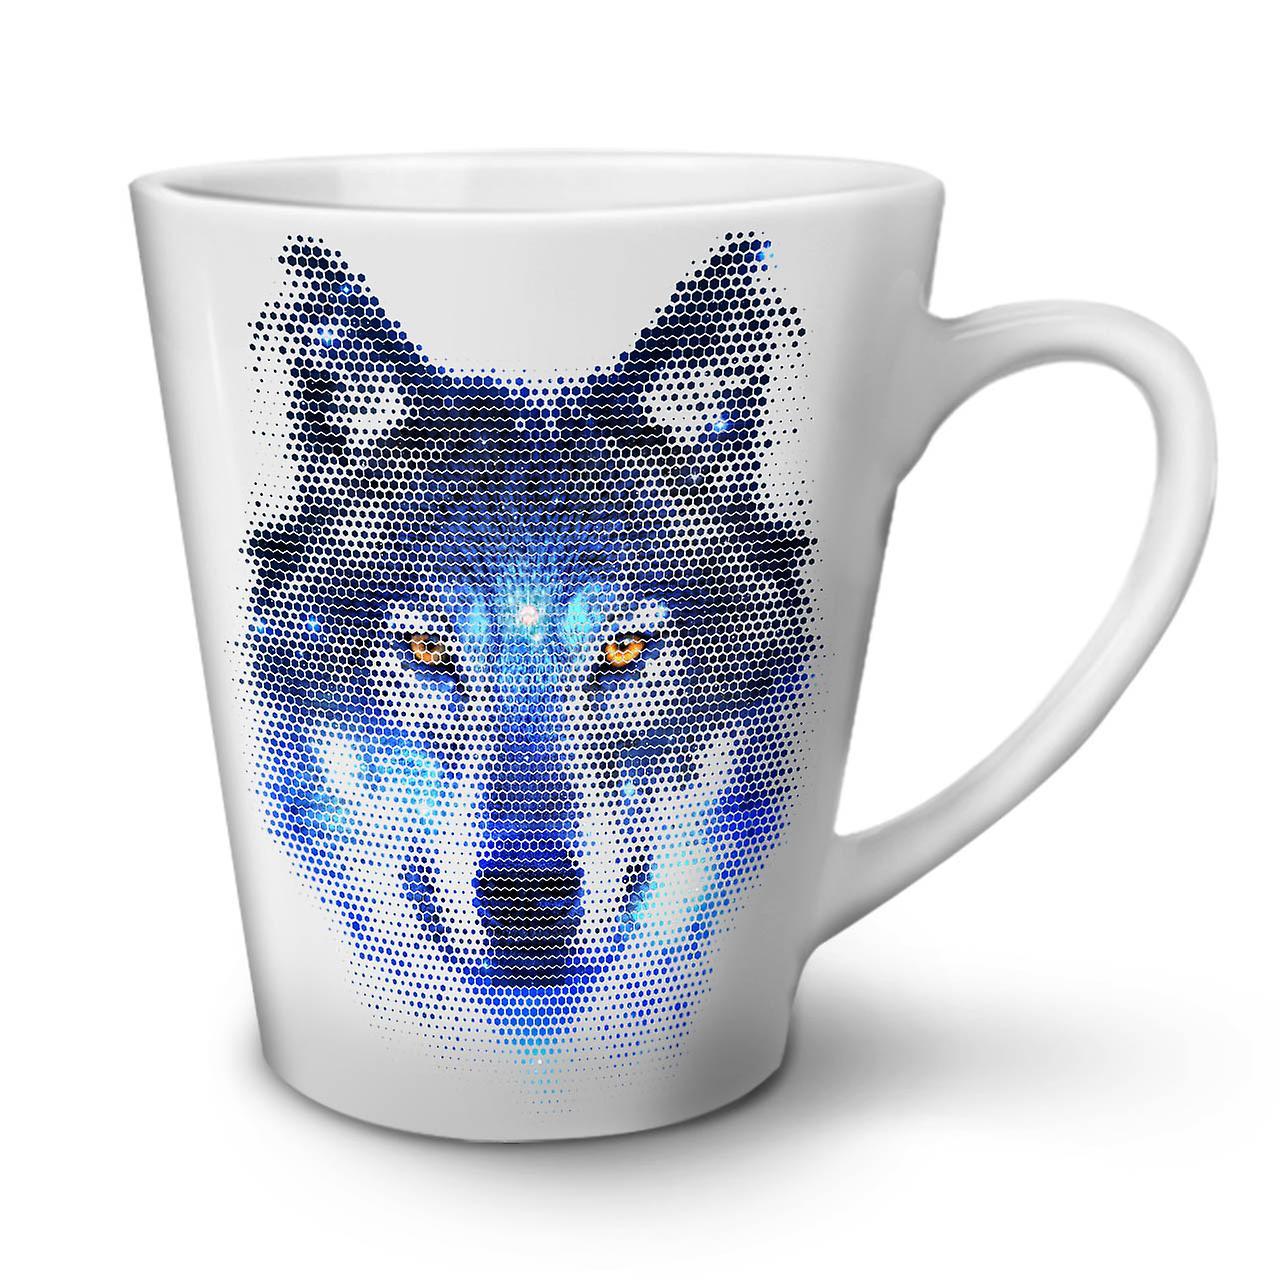 Mug Life Latte Ceramic 12 Forest Wolf Pixel Tea New OzWellcoda Coffee White Tl1FJcK